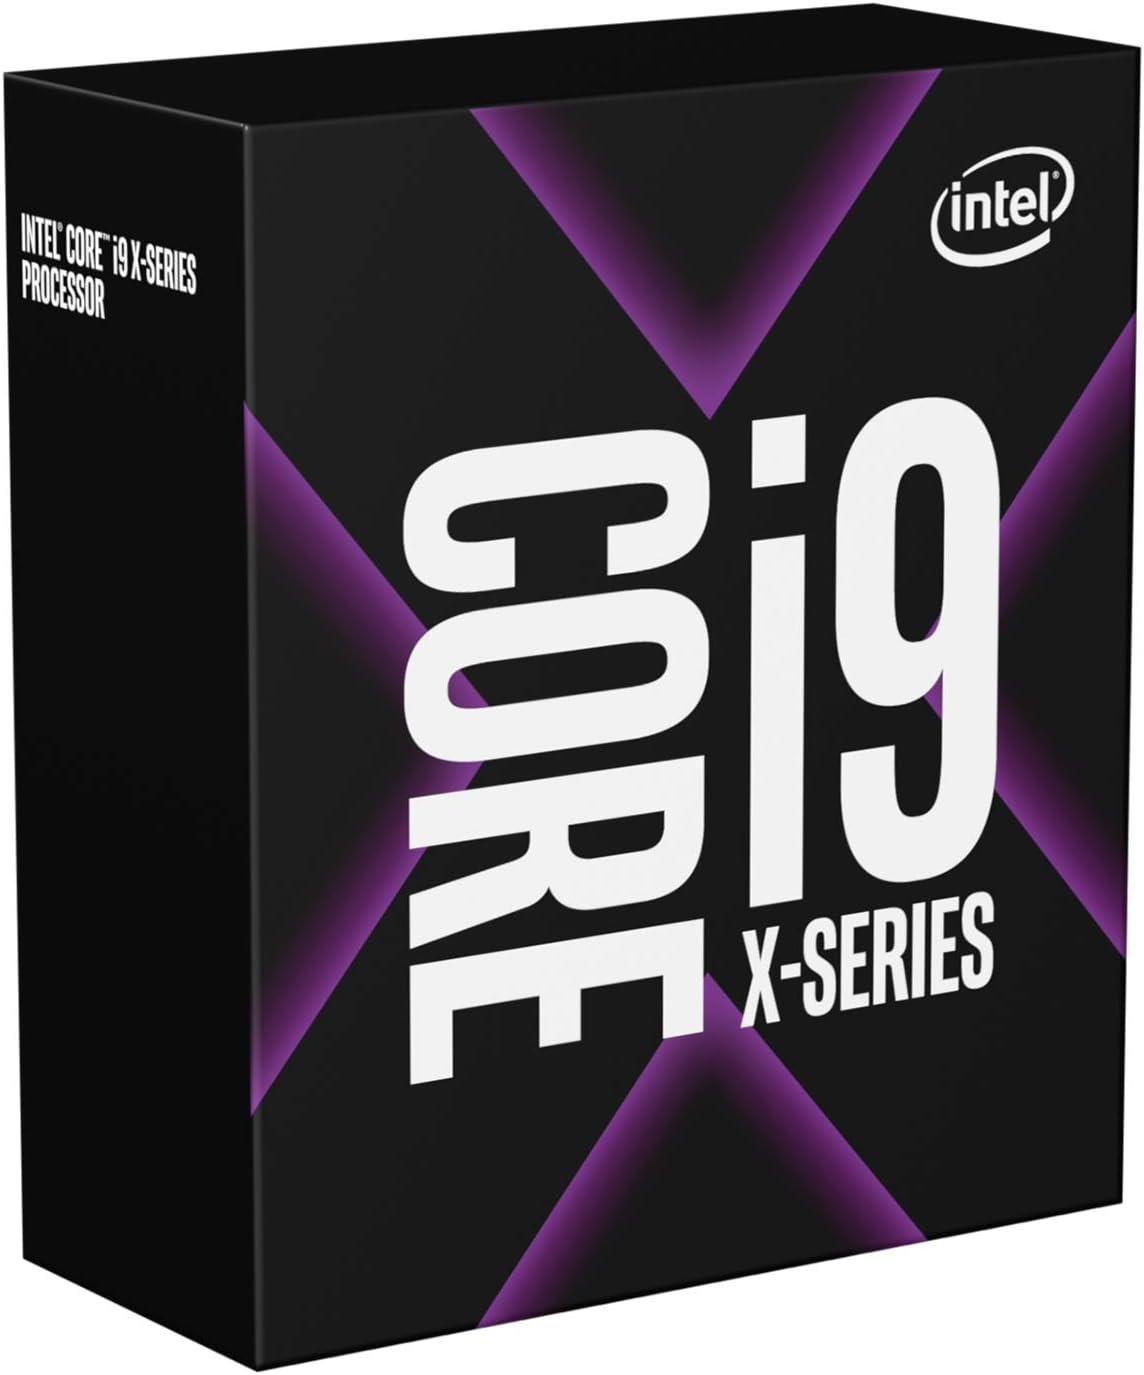 Intel Ranking TOP1 Core i9-10900X Desktop Ranking TOP12 Processor 10 to Unl 4.7GHz up Cores